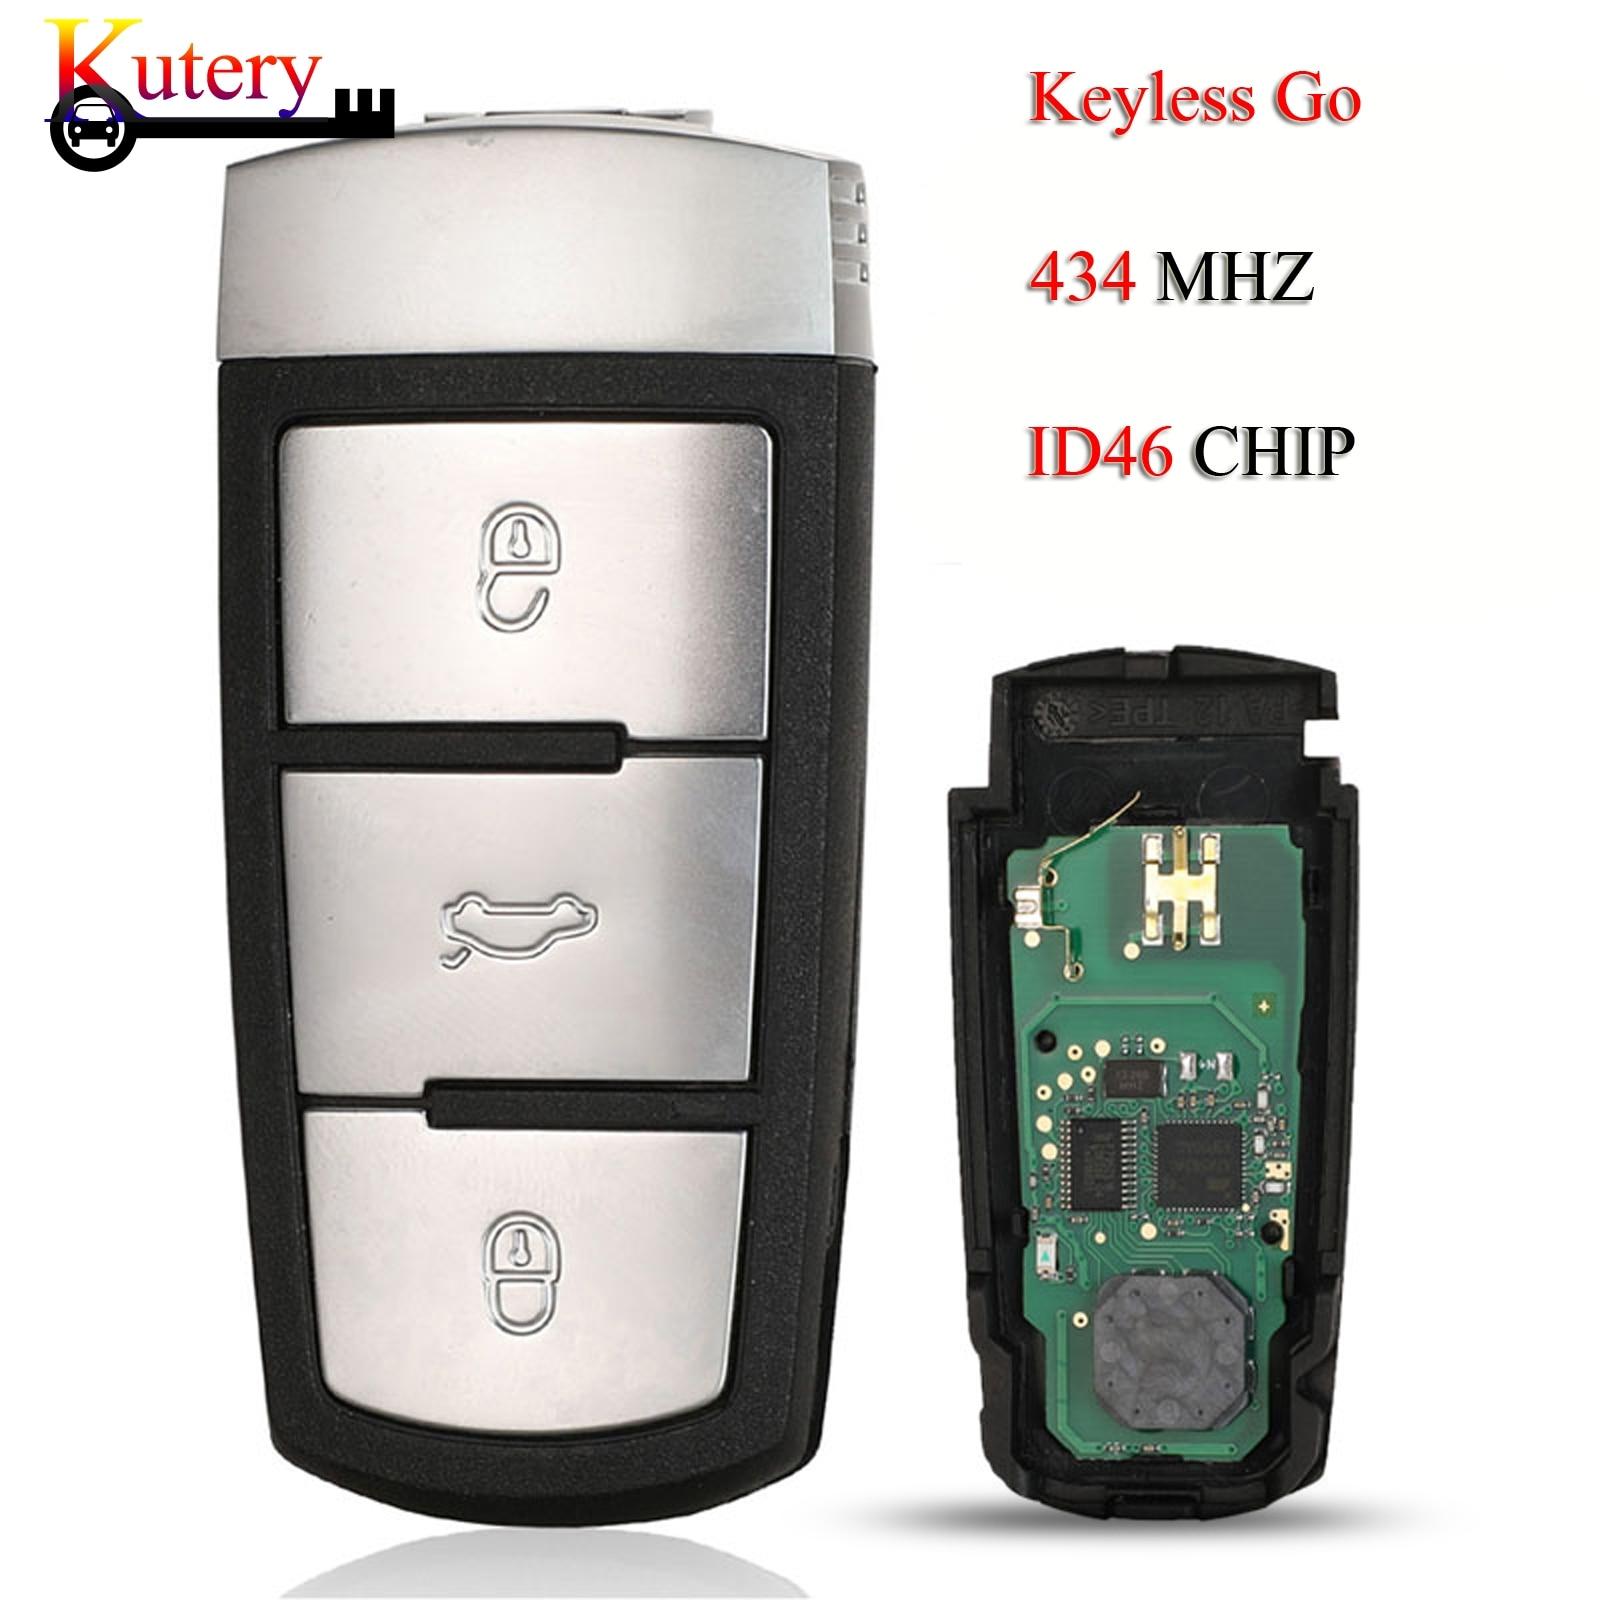 Kutery keyless-go chave do carro remoto para volkswagen vw passat cc magotan 3 botões 434mhz id46 pcf7936 chip 3c0959752bg